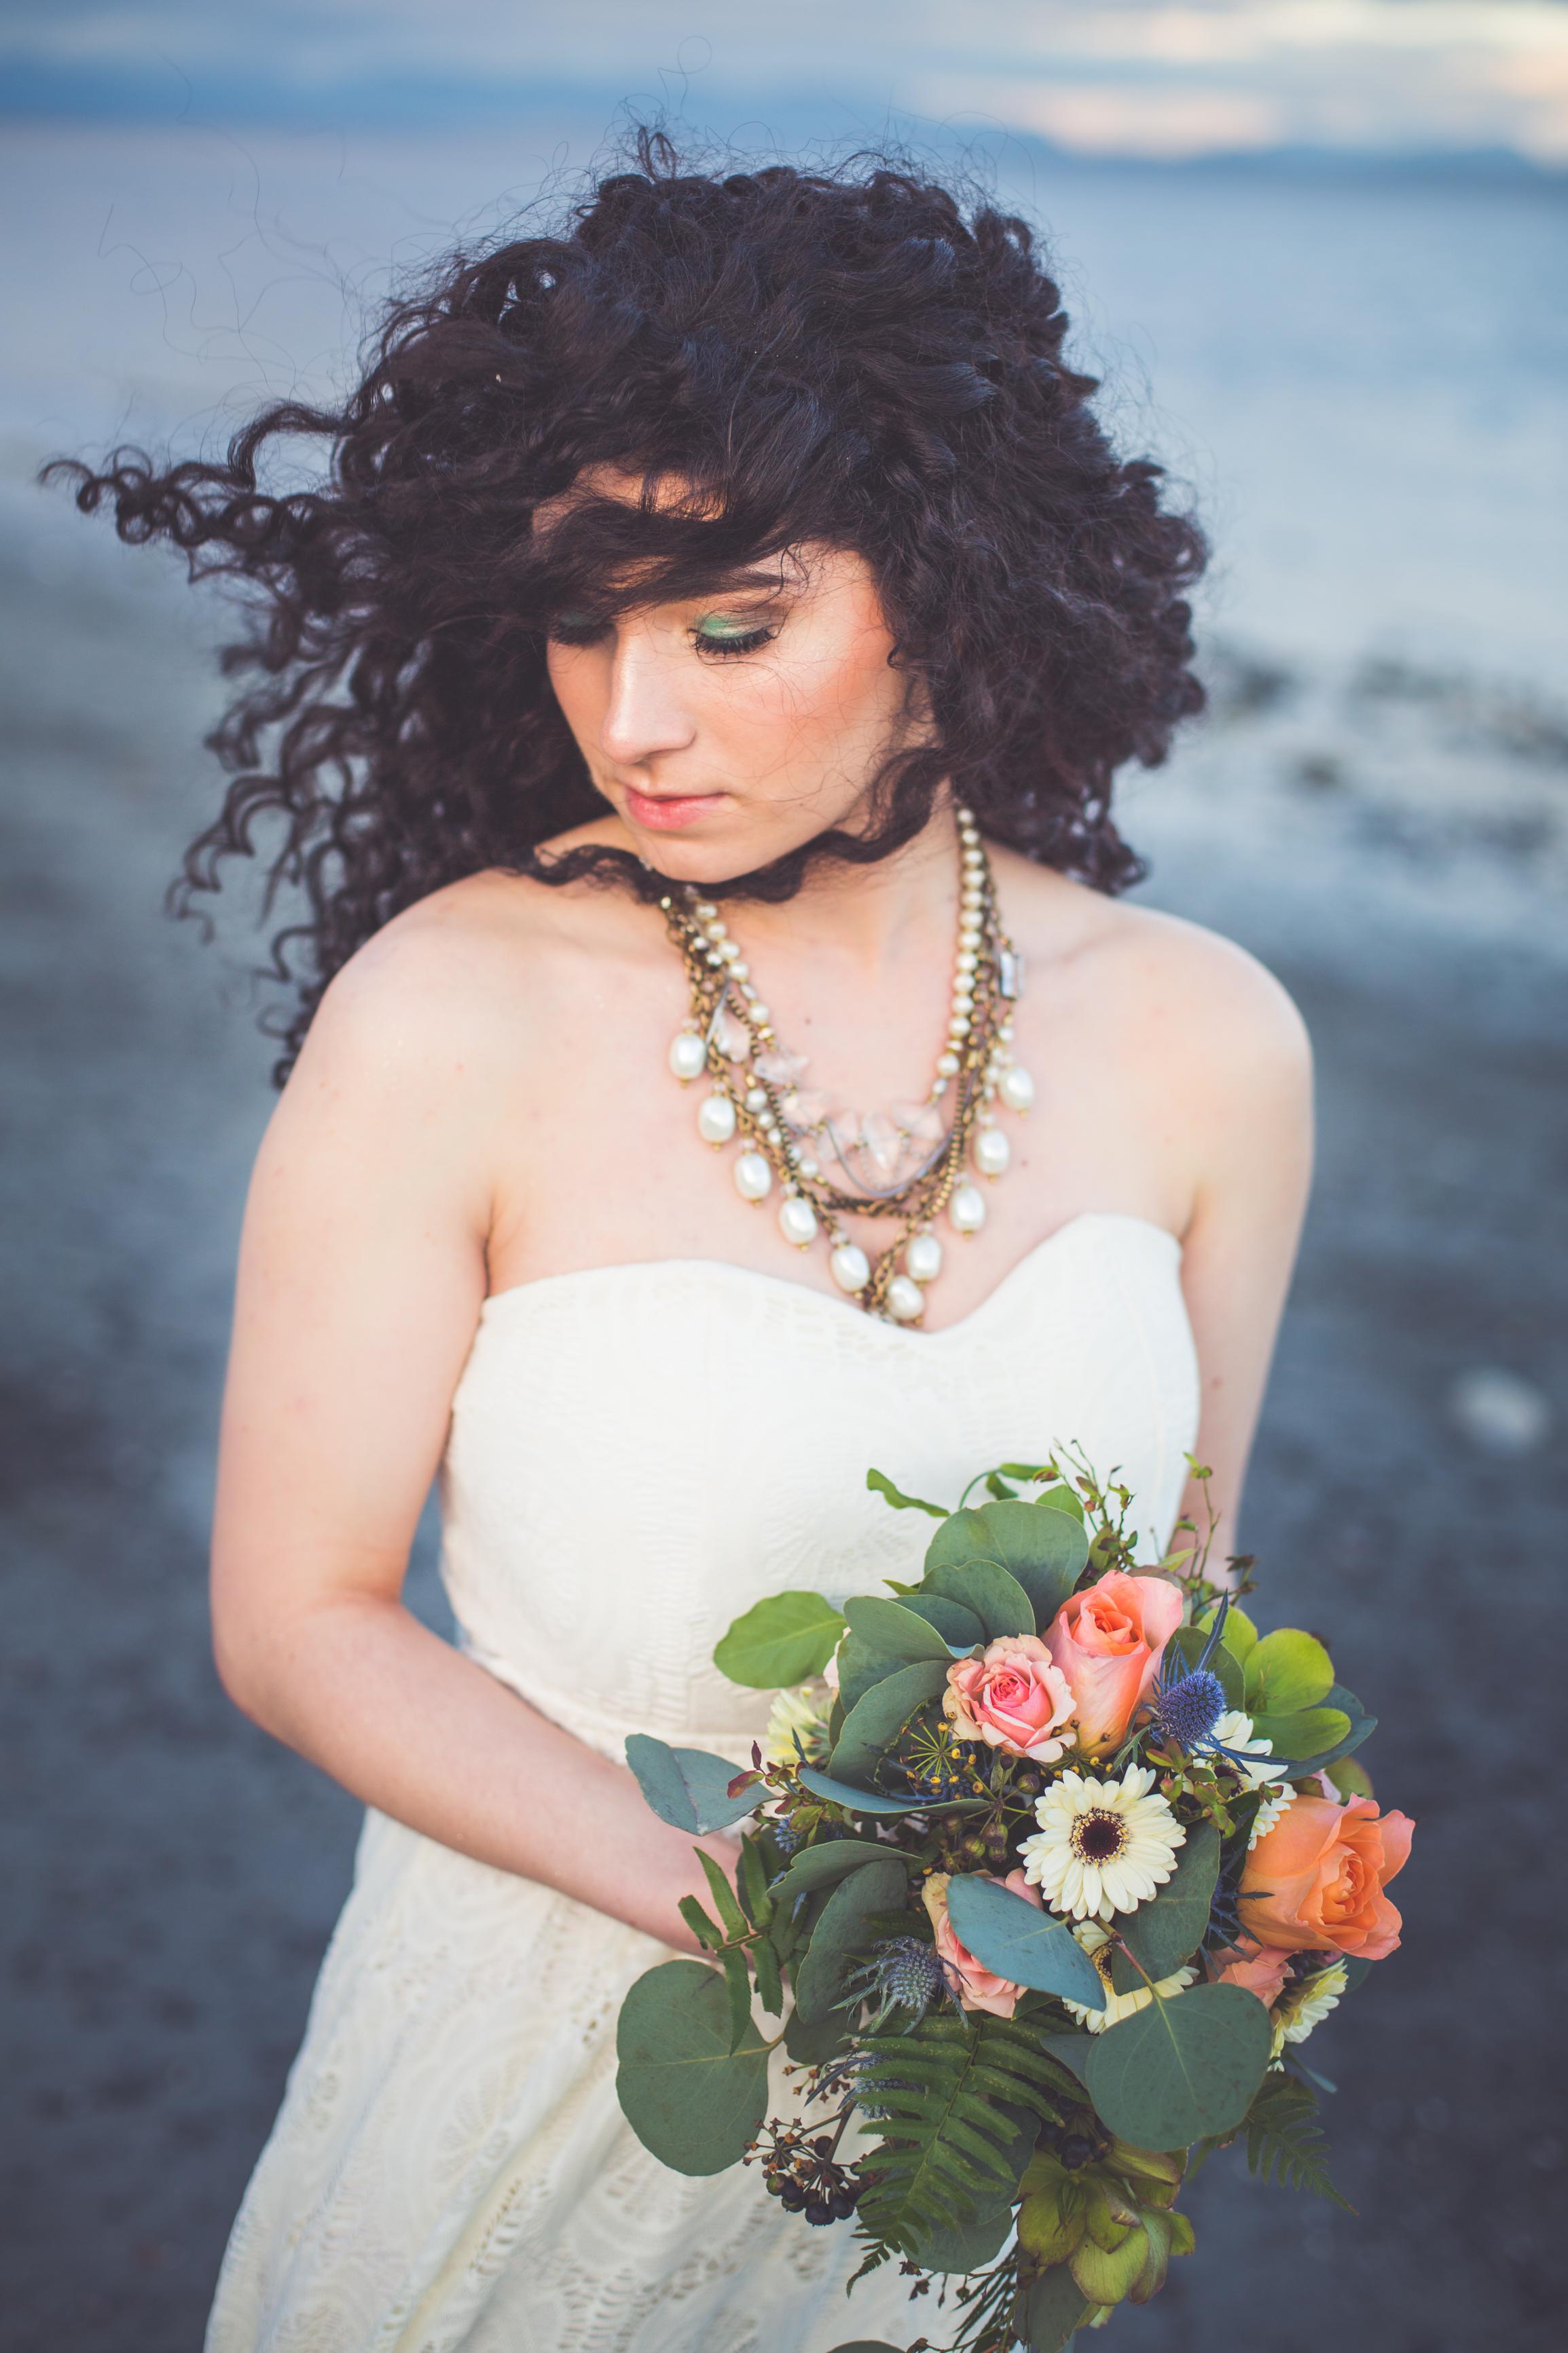 windblown hair on bride